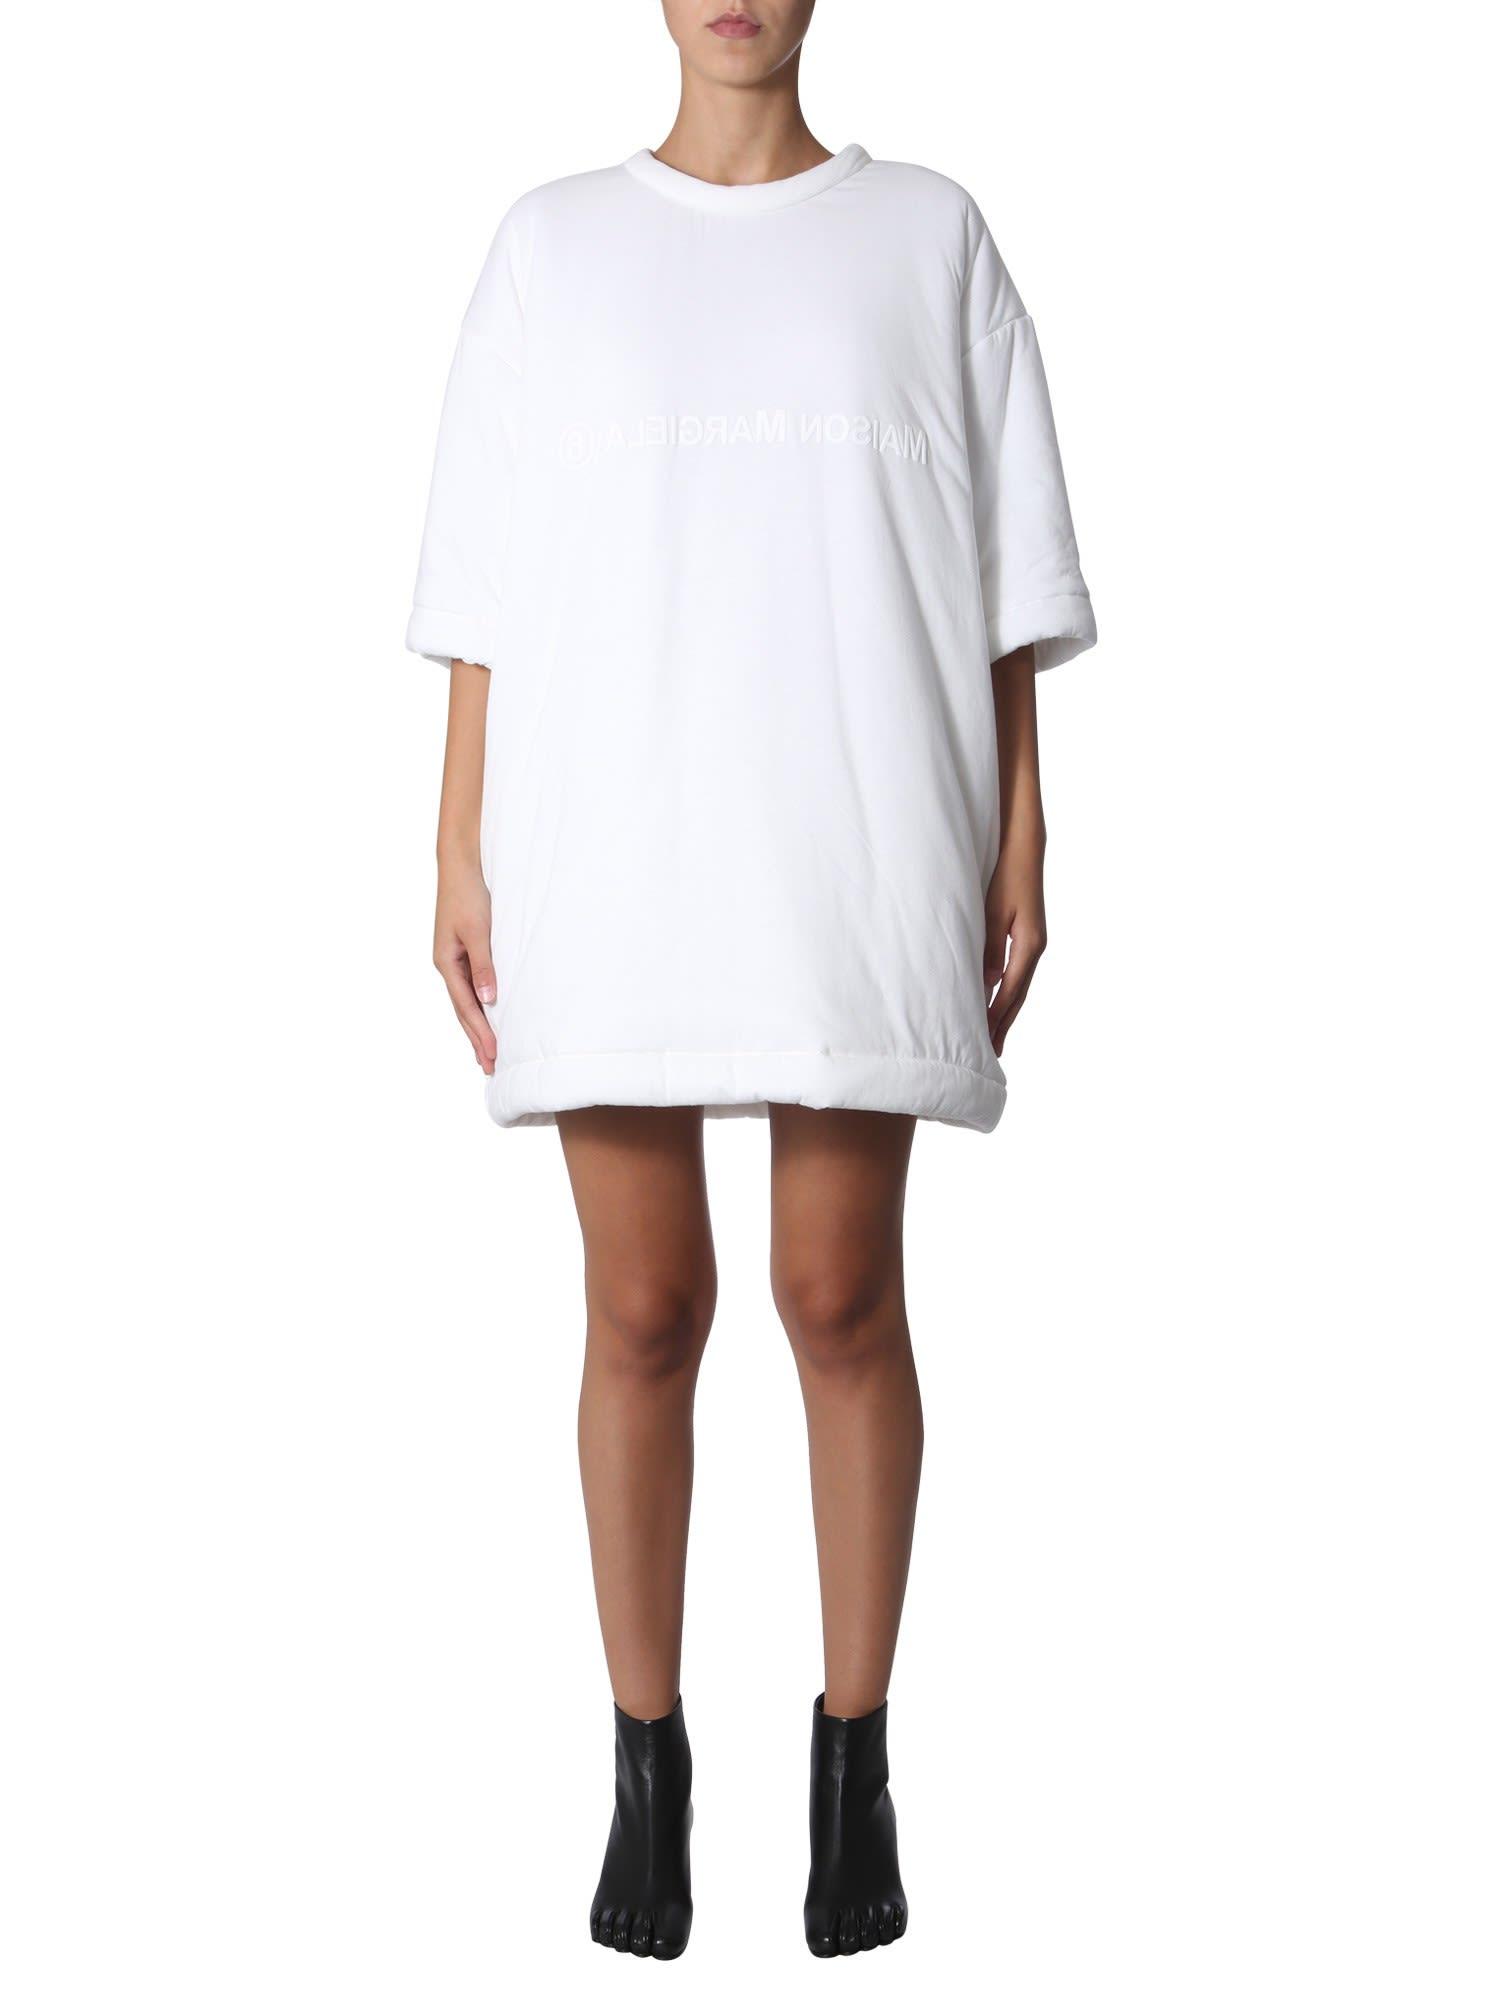 MM6 Maison Margiela Padded Dress